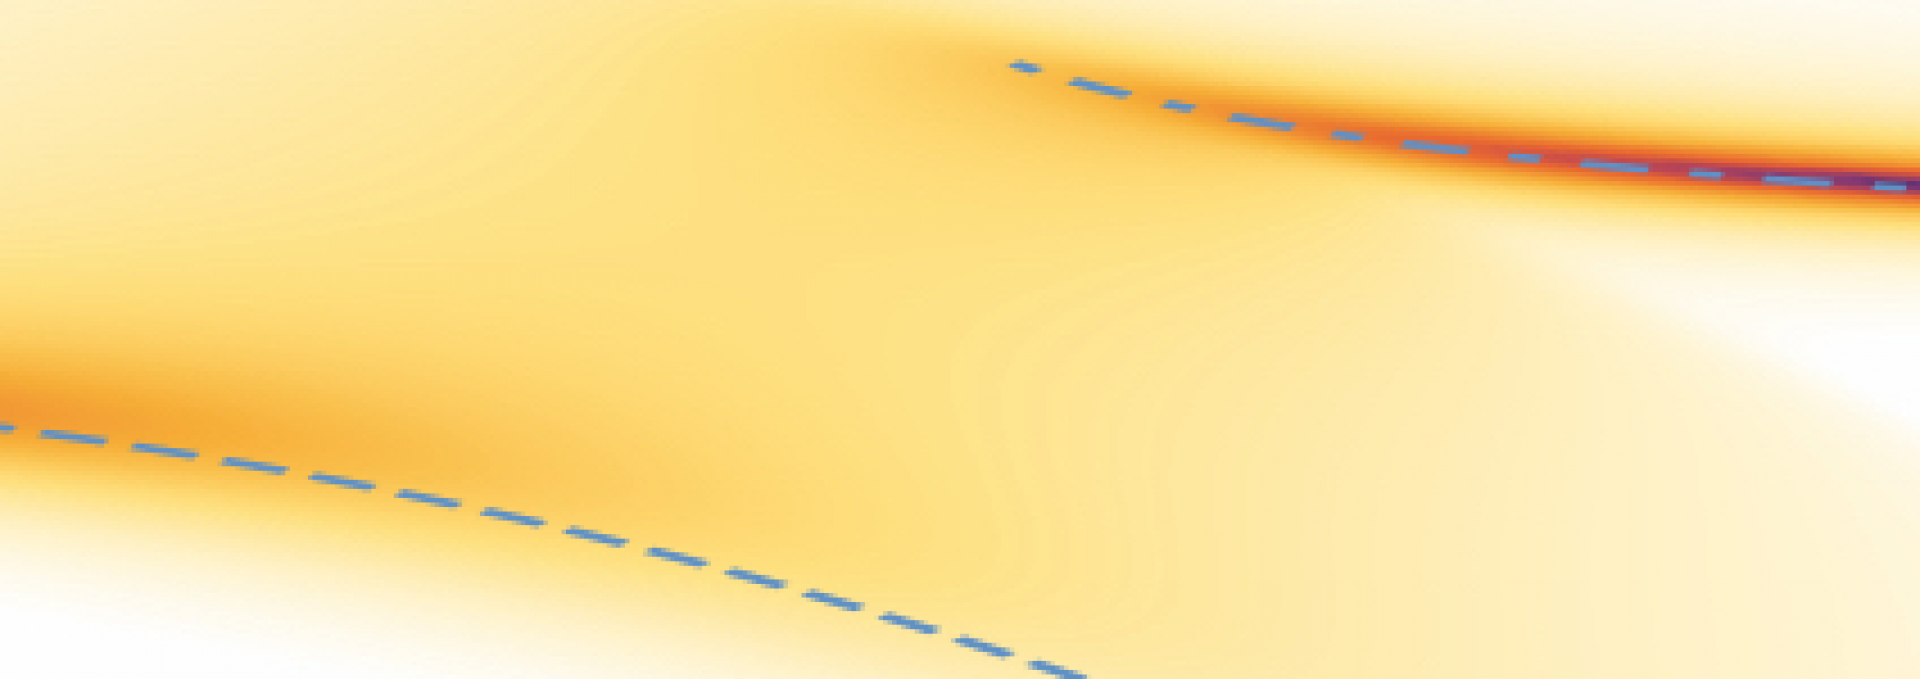 Quantum Matter Theory